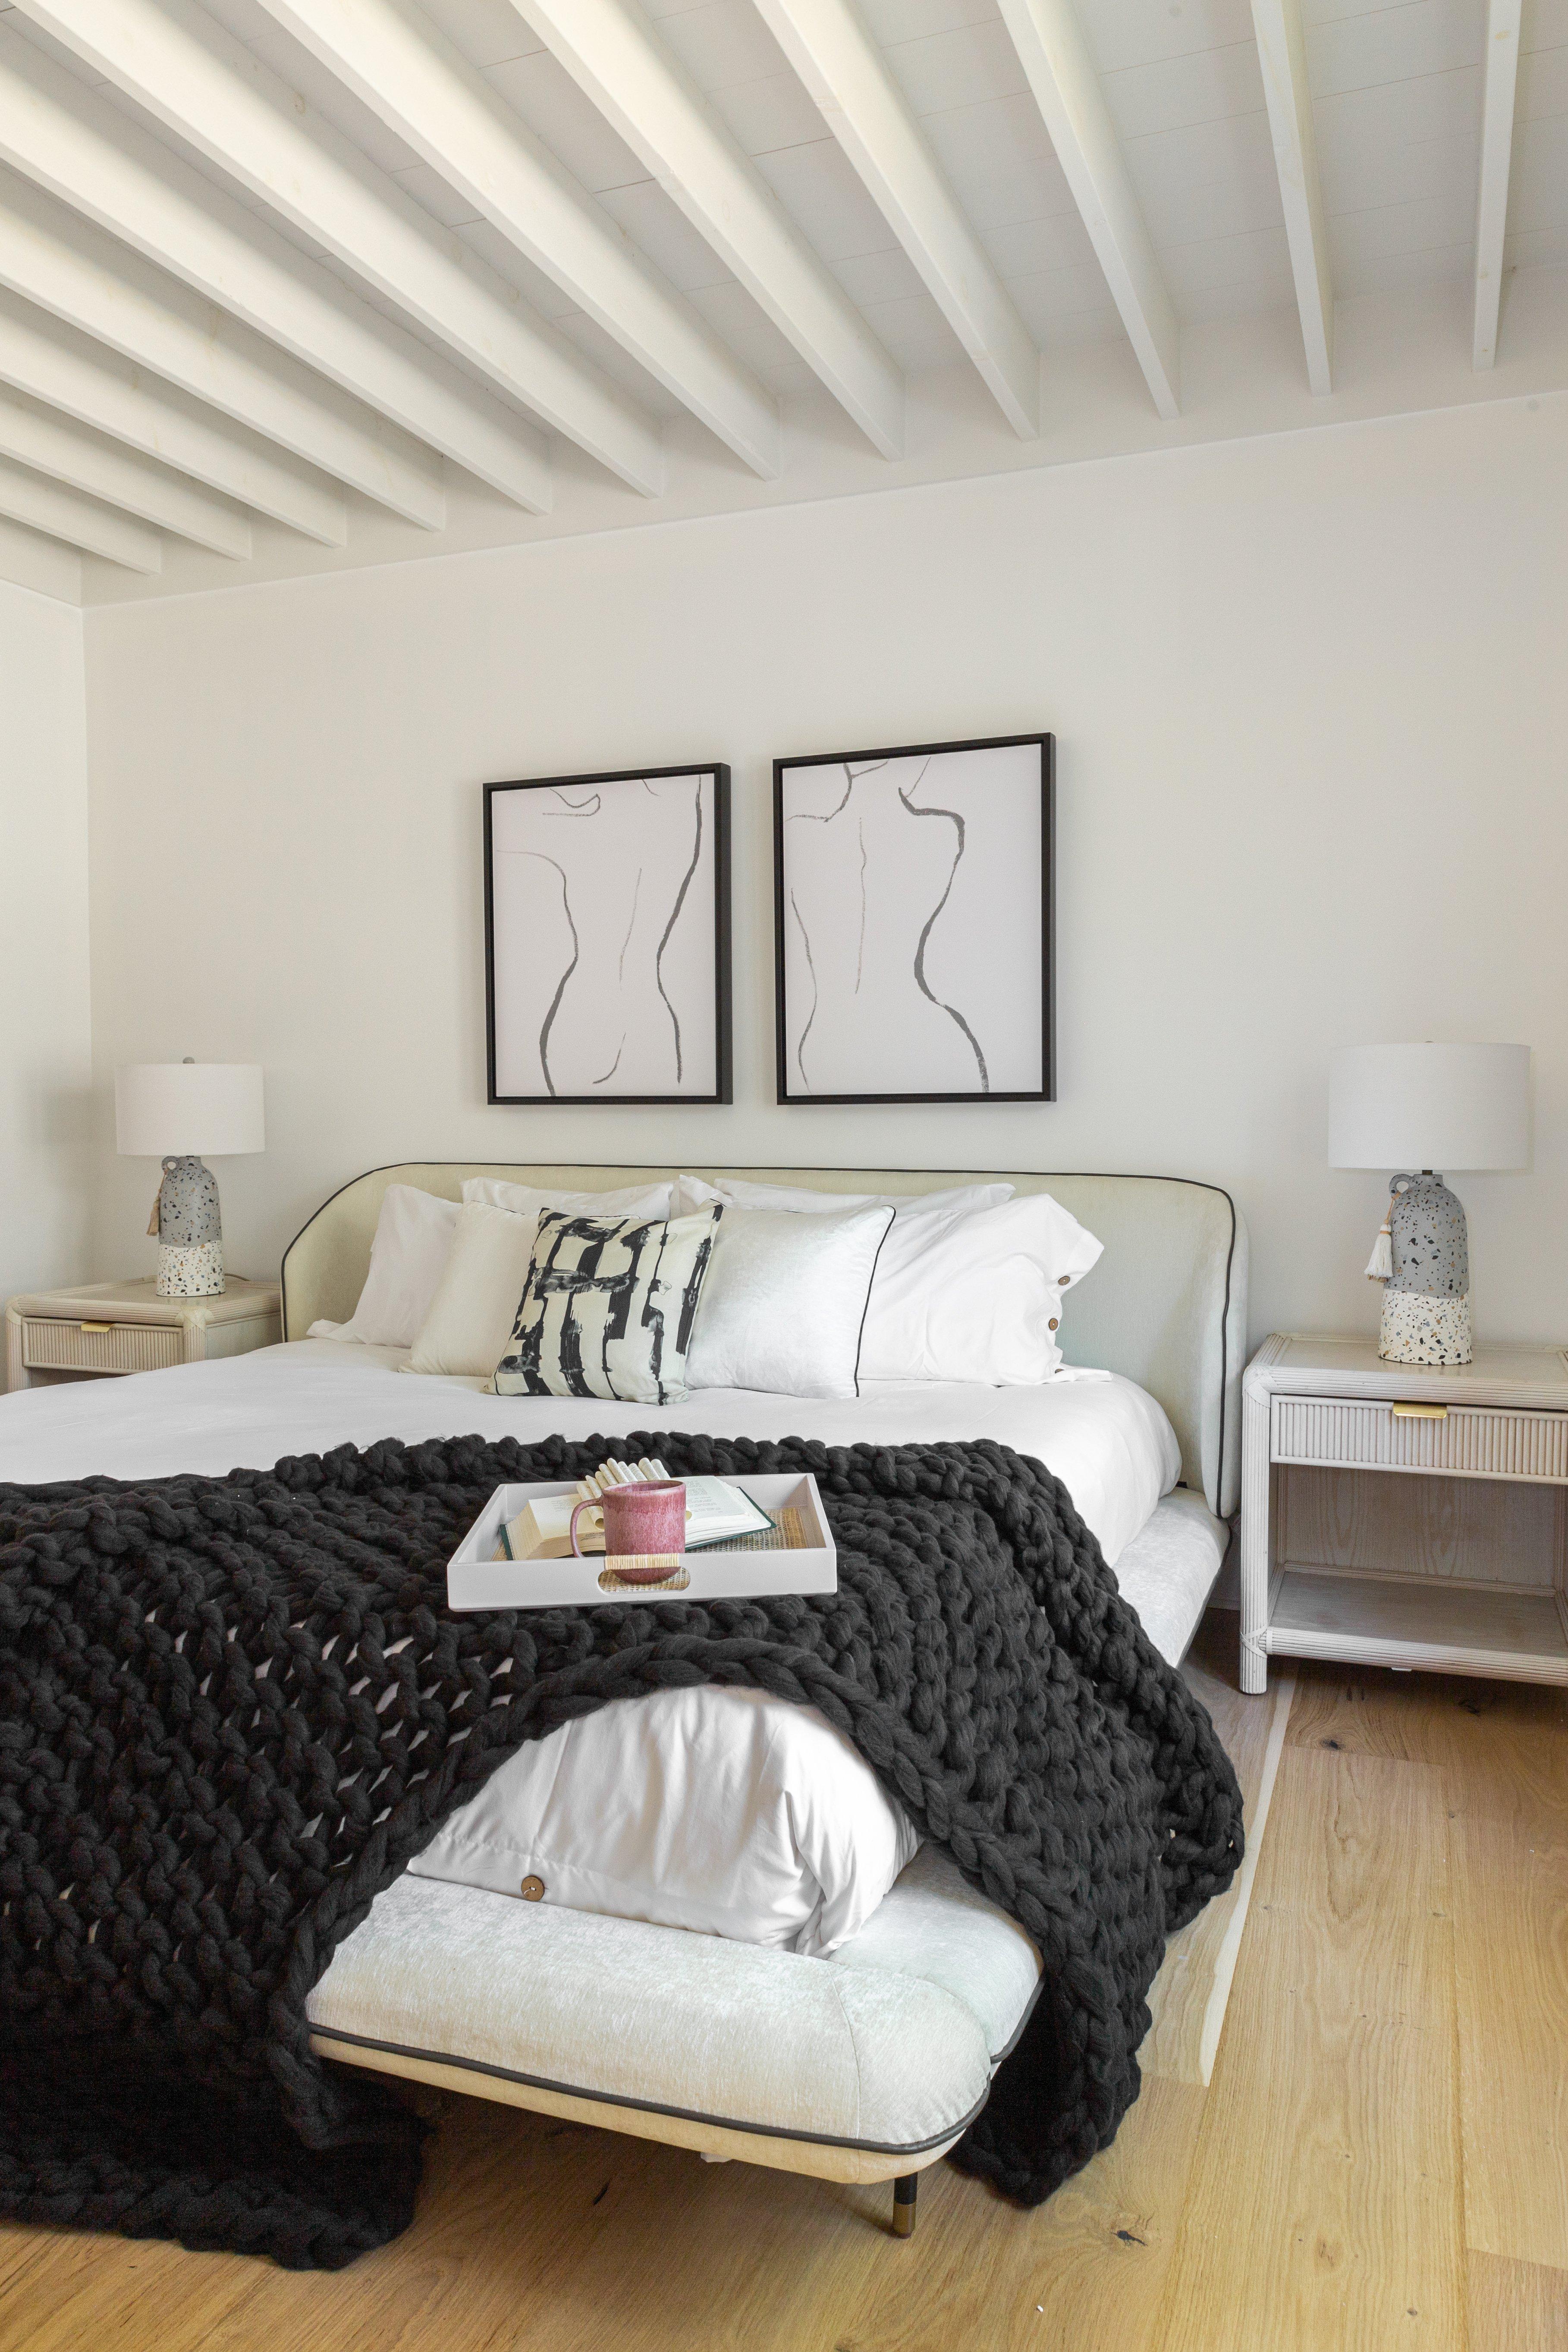 02 master bedroom 20210721-IMG_0111-HDR.jpg